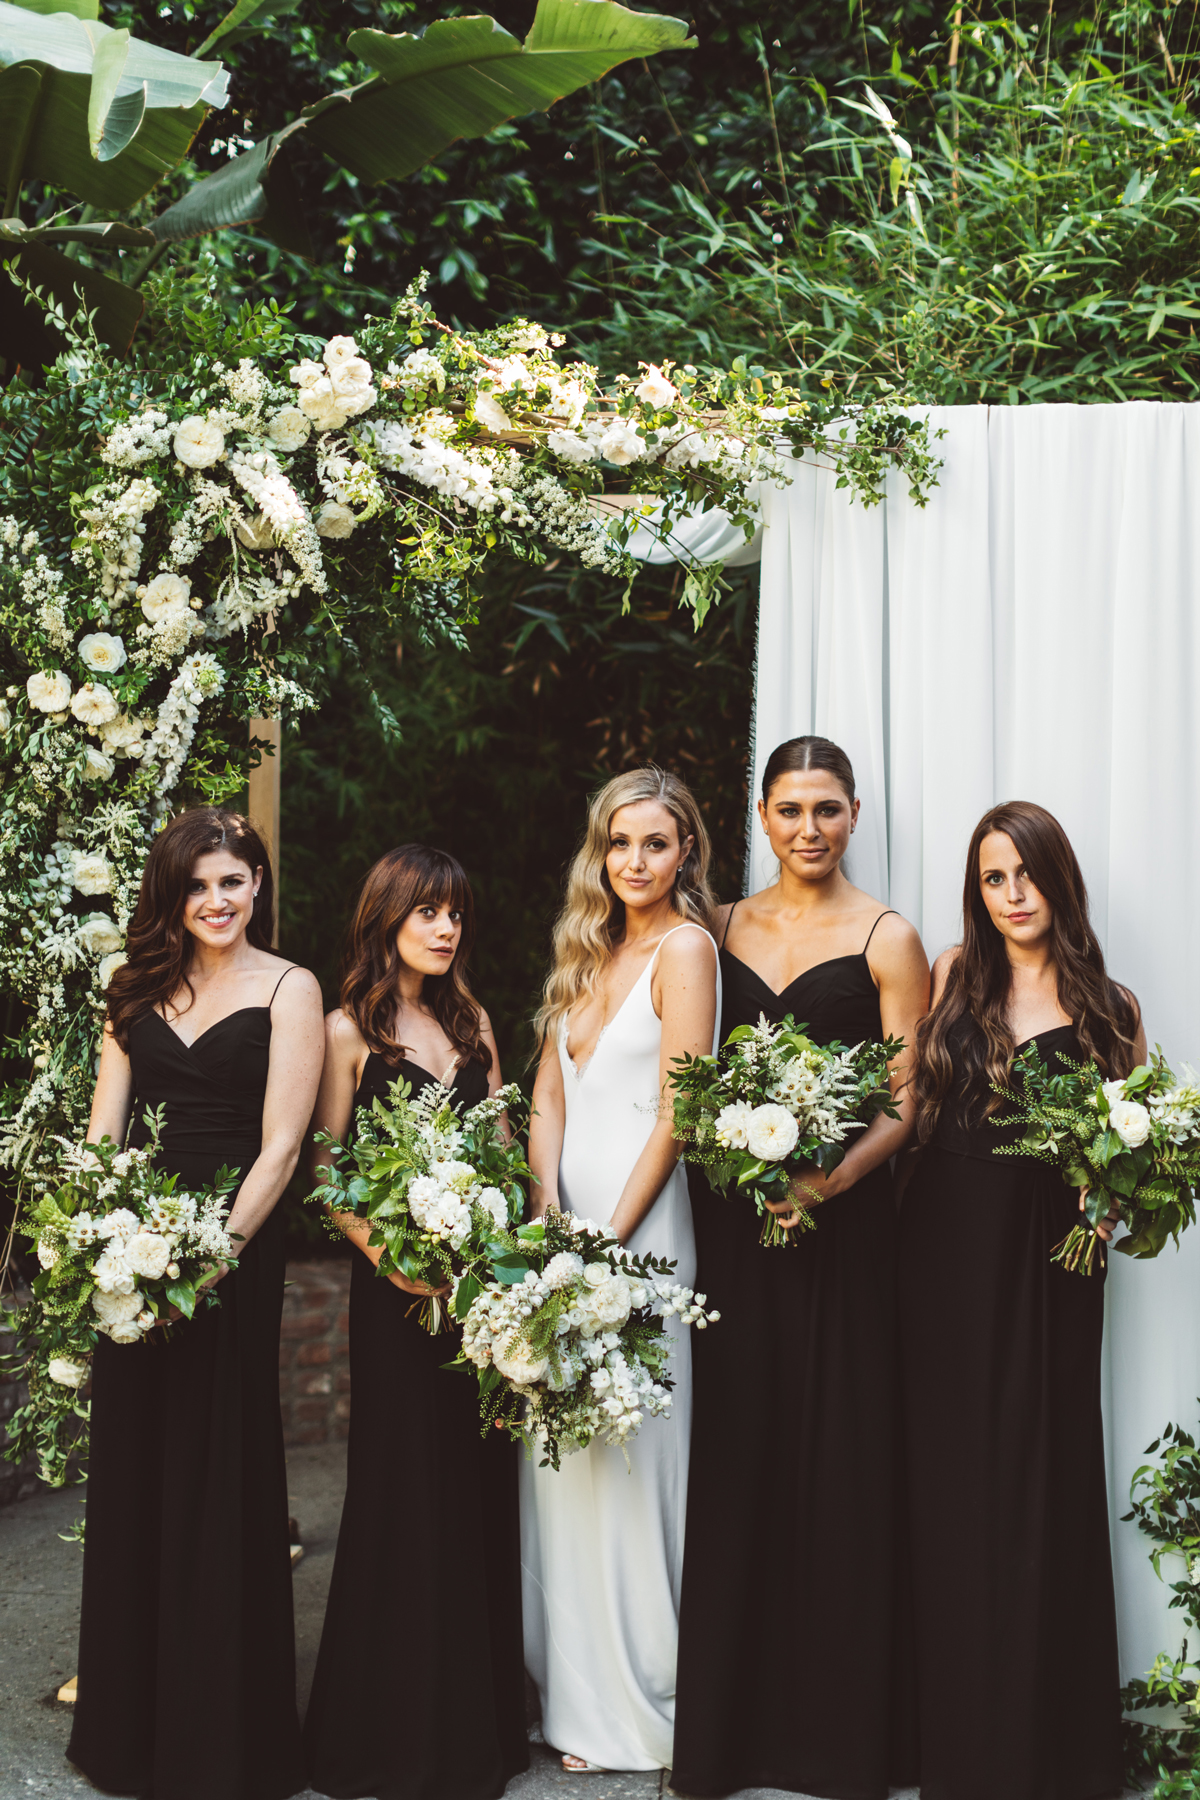 kaily matt wedding los angeles bride and bridesmaids